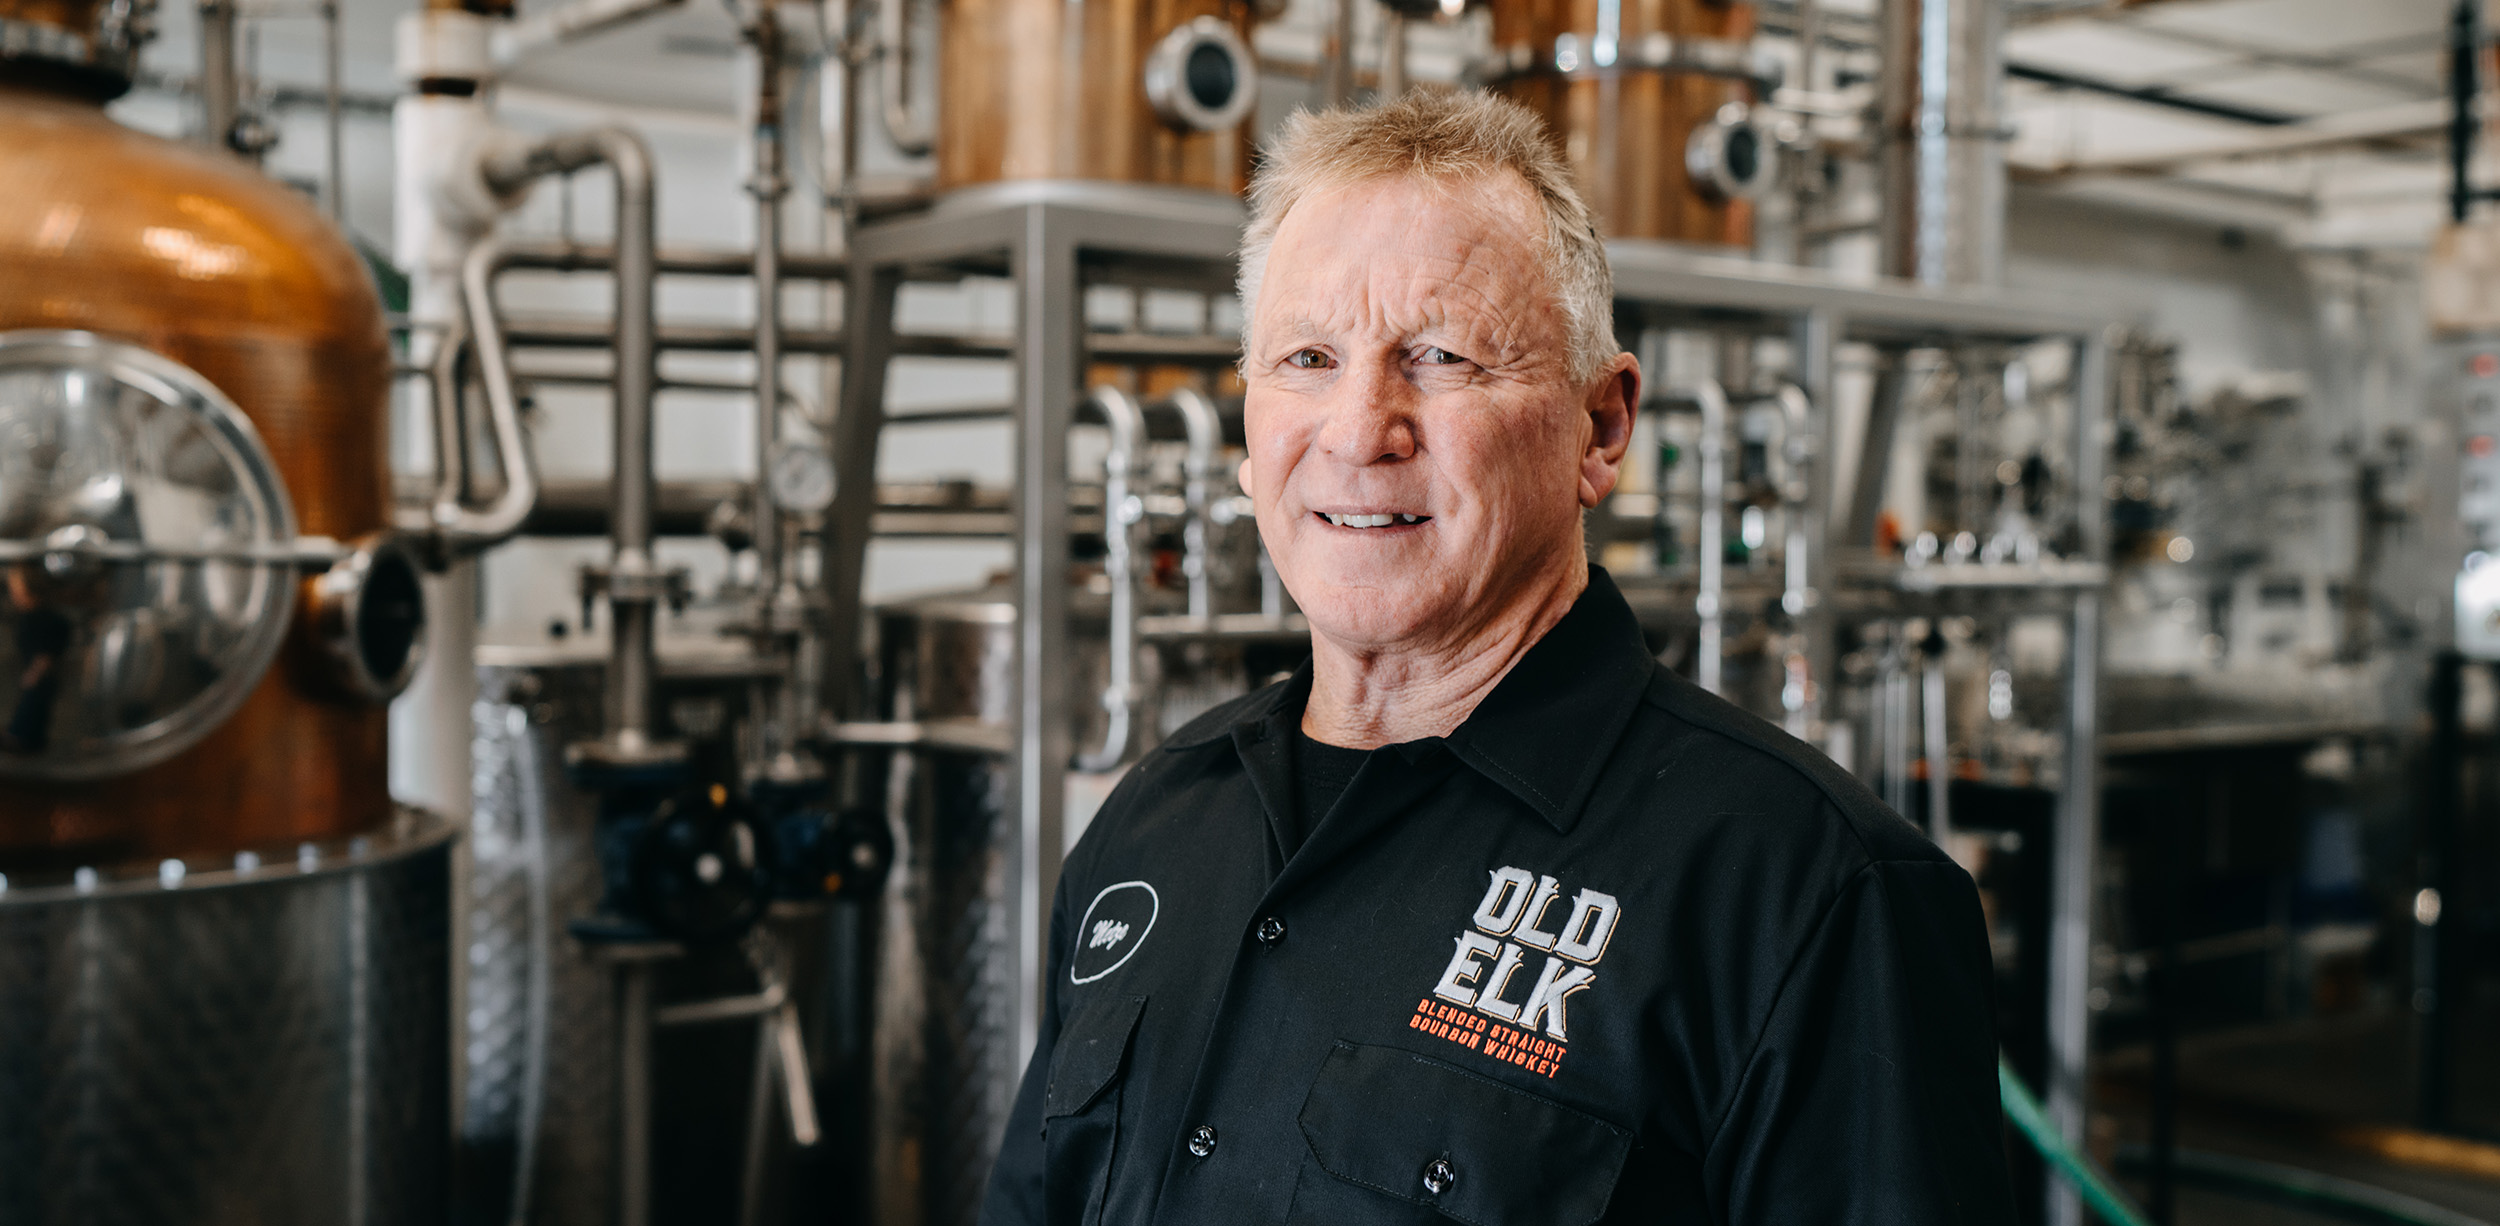 GREG METZE - Master DistillerGreg Metze became Old Elk Distillery's Master Distiller following a 38-year career at Seagram's Distillery in Lawrenceburg, Indiana, one of the world's largest distilleries.